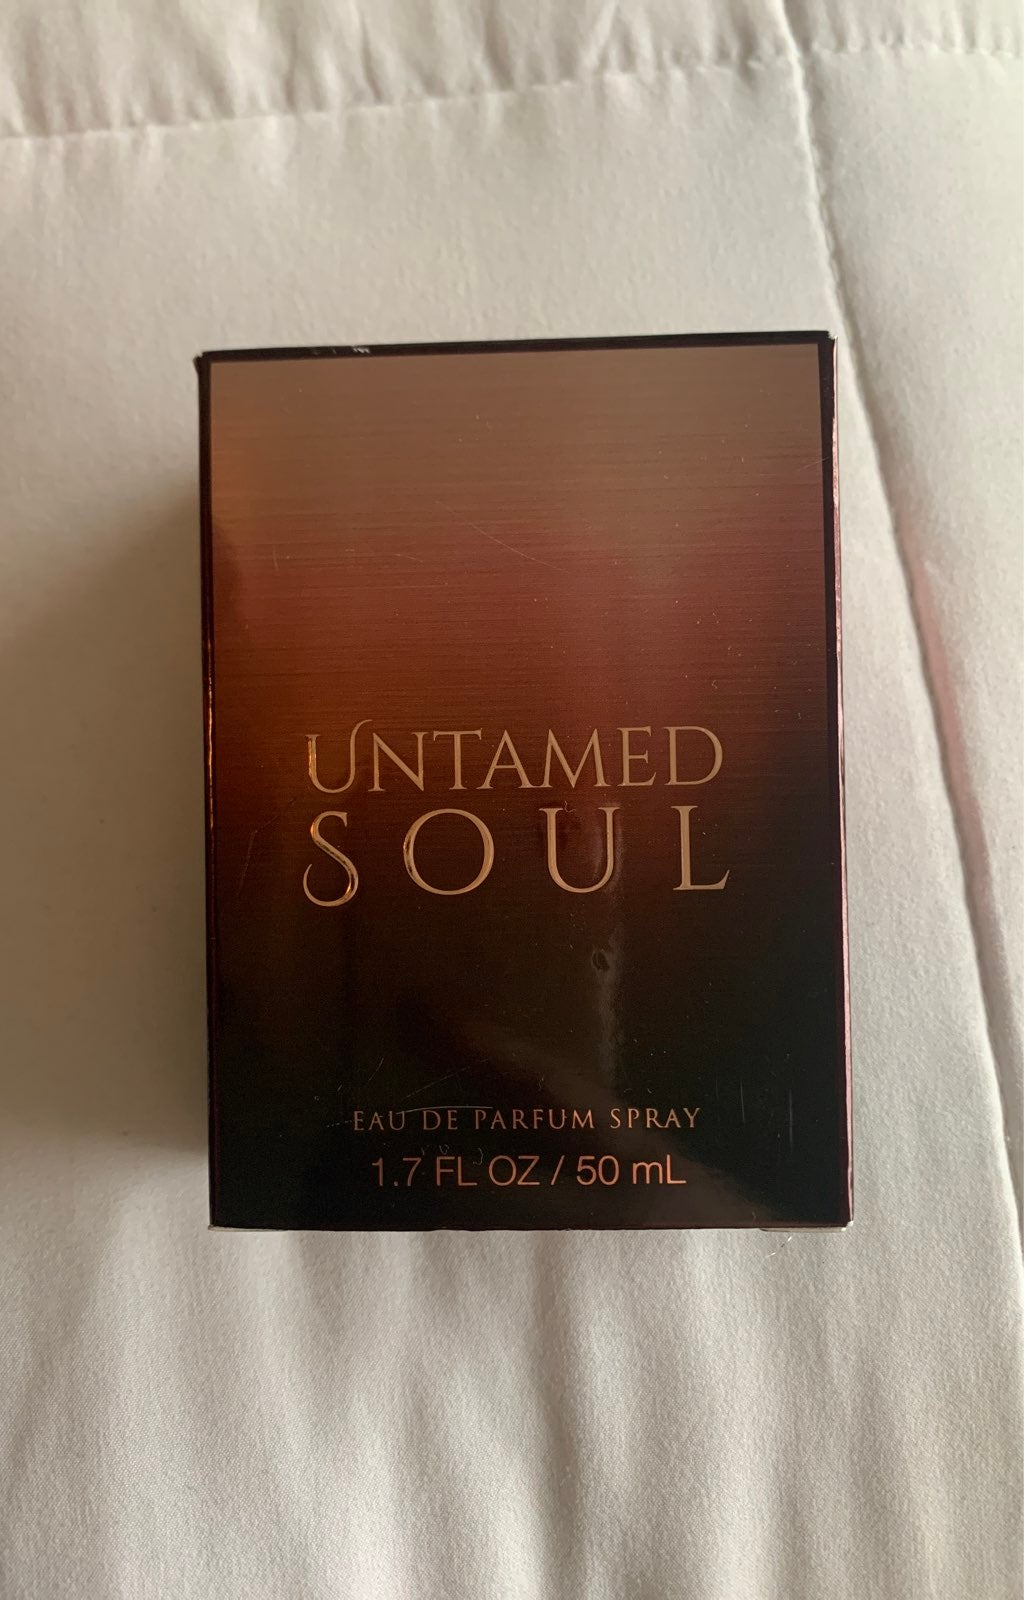 Untamed soul perfume